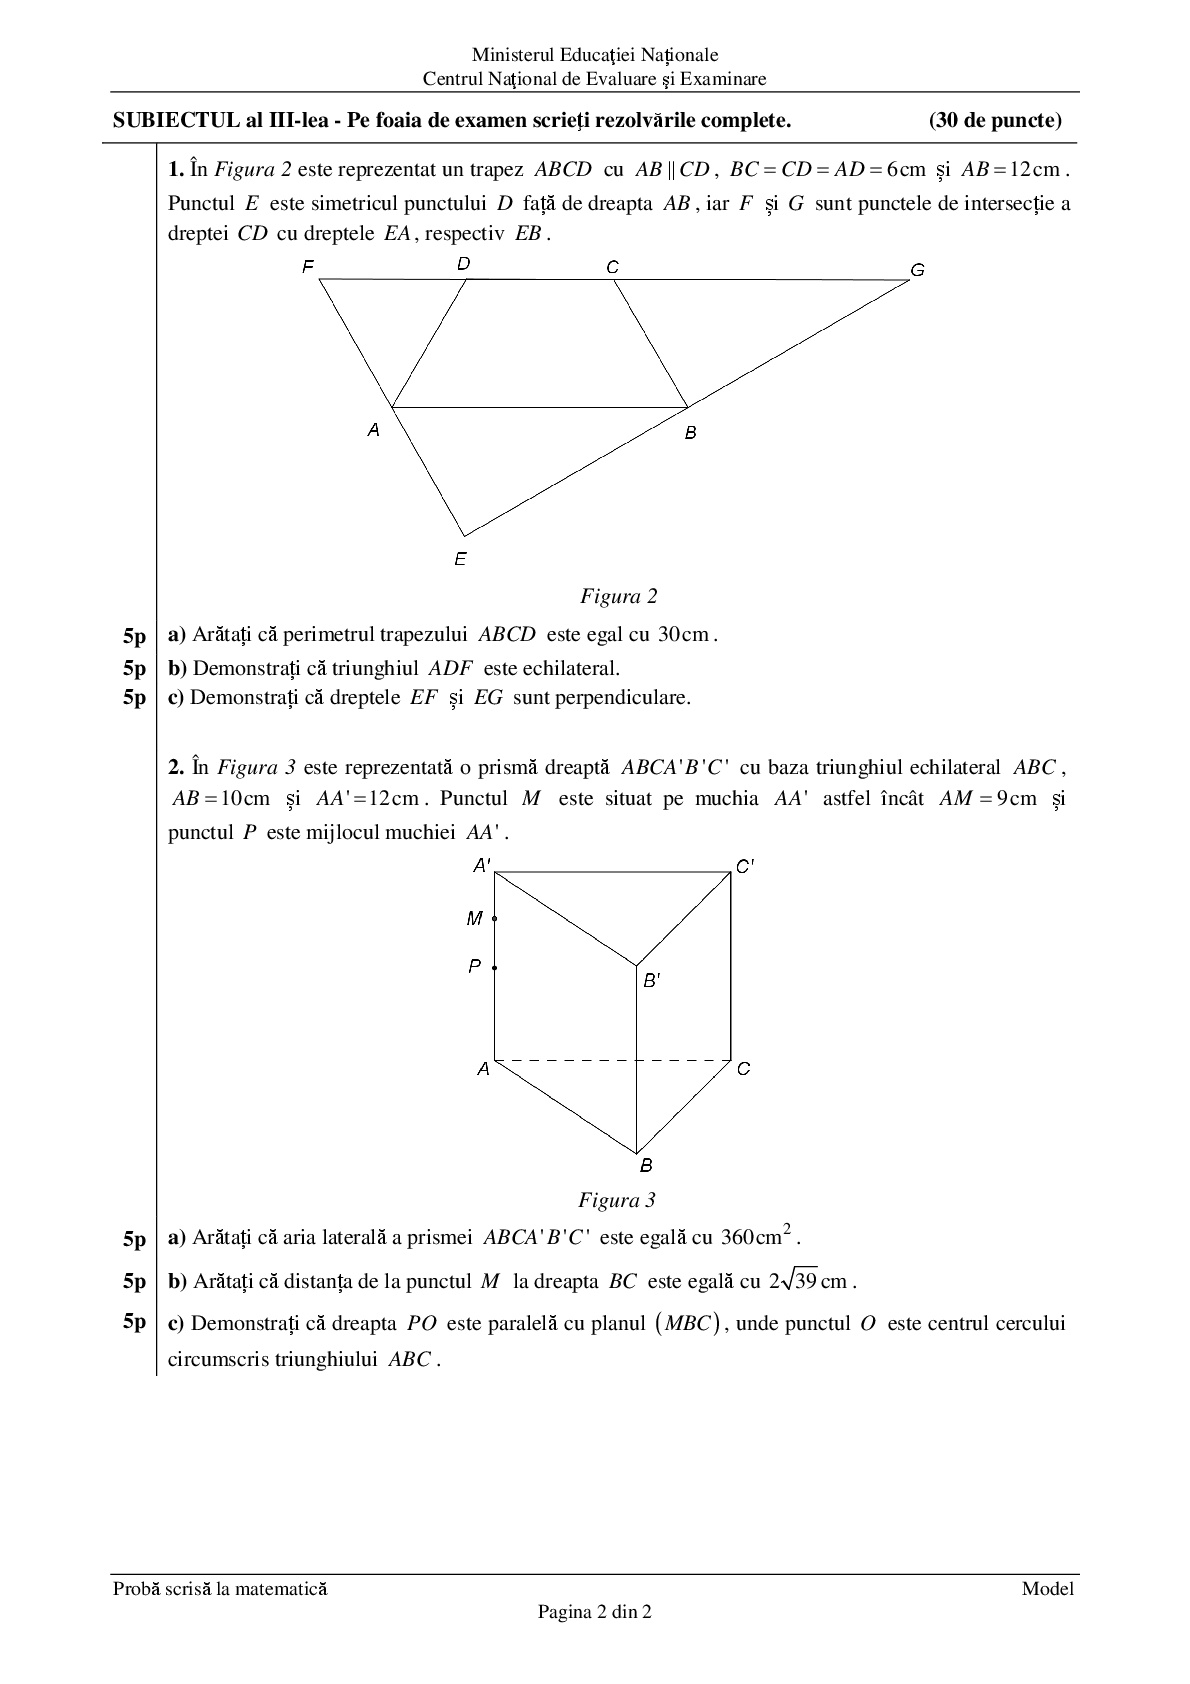 EN_matematica_2019_var_model_LRO-002